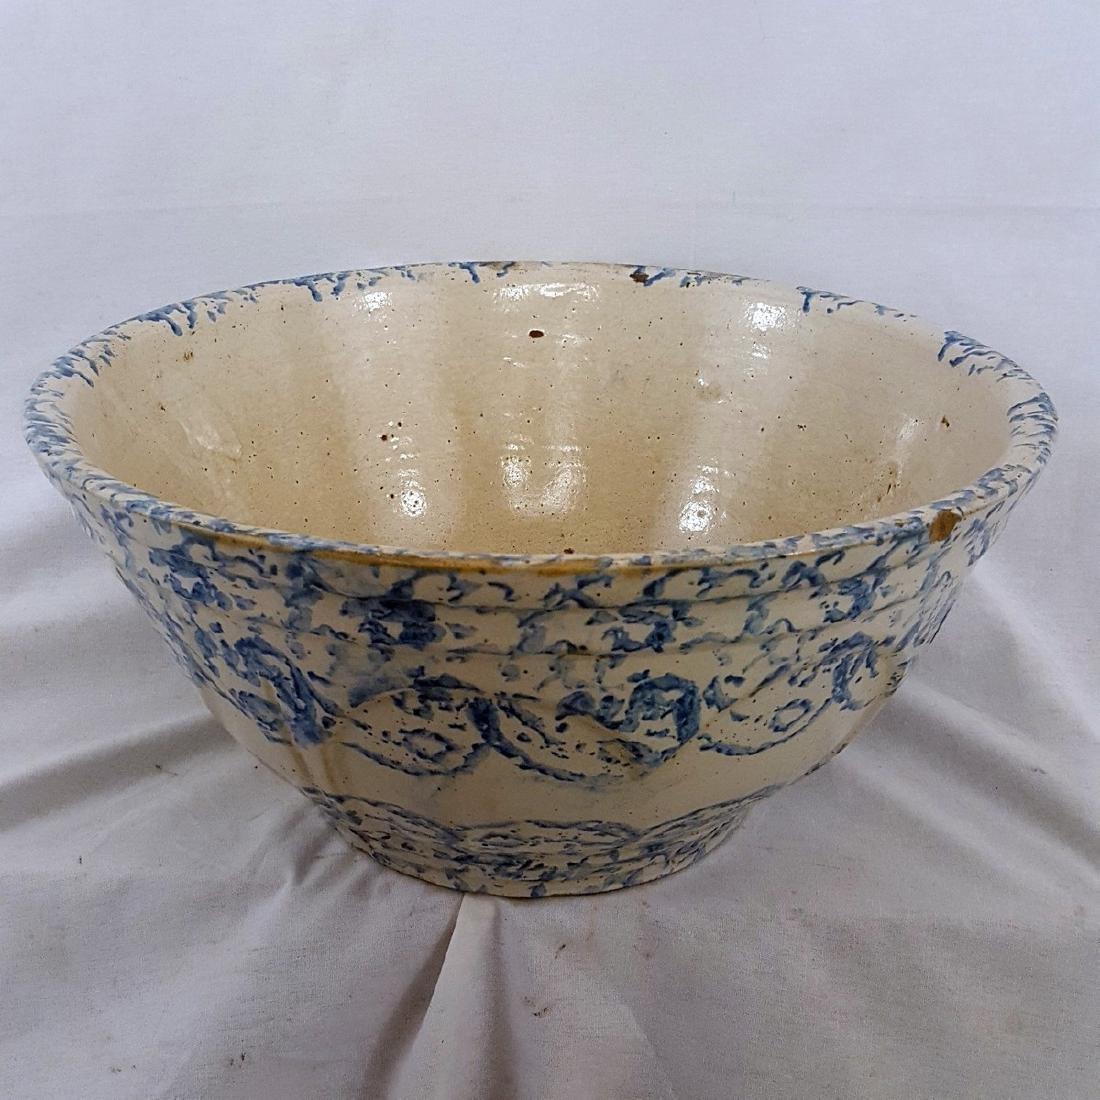 Very Large Blue Spongeware Bowl Ca 1880-1900 - 2